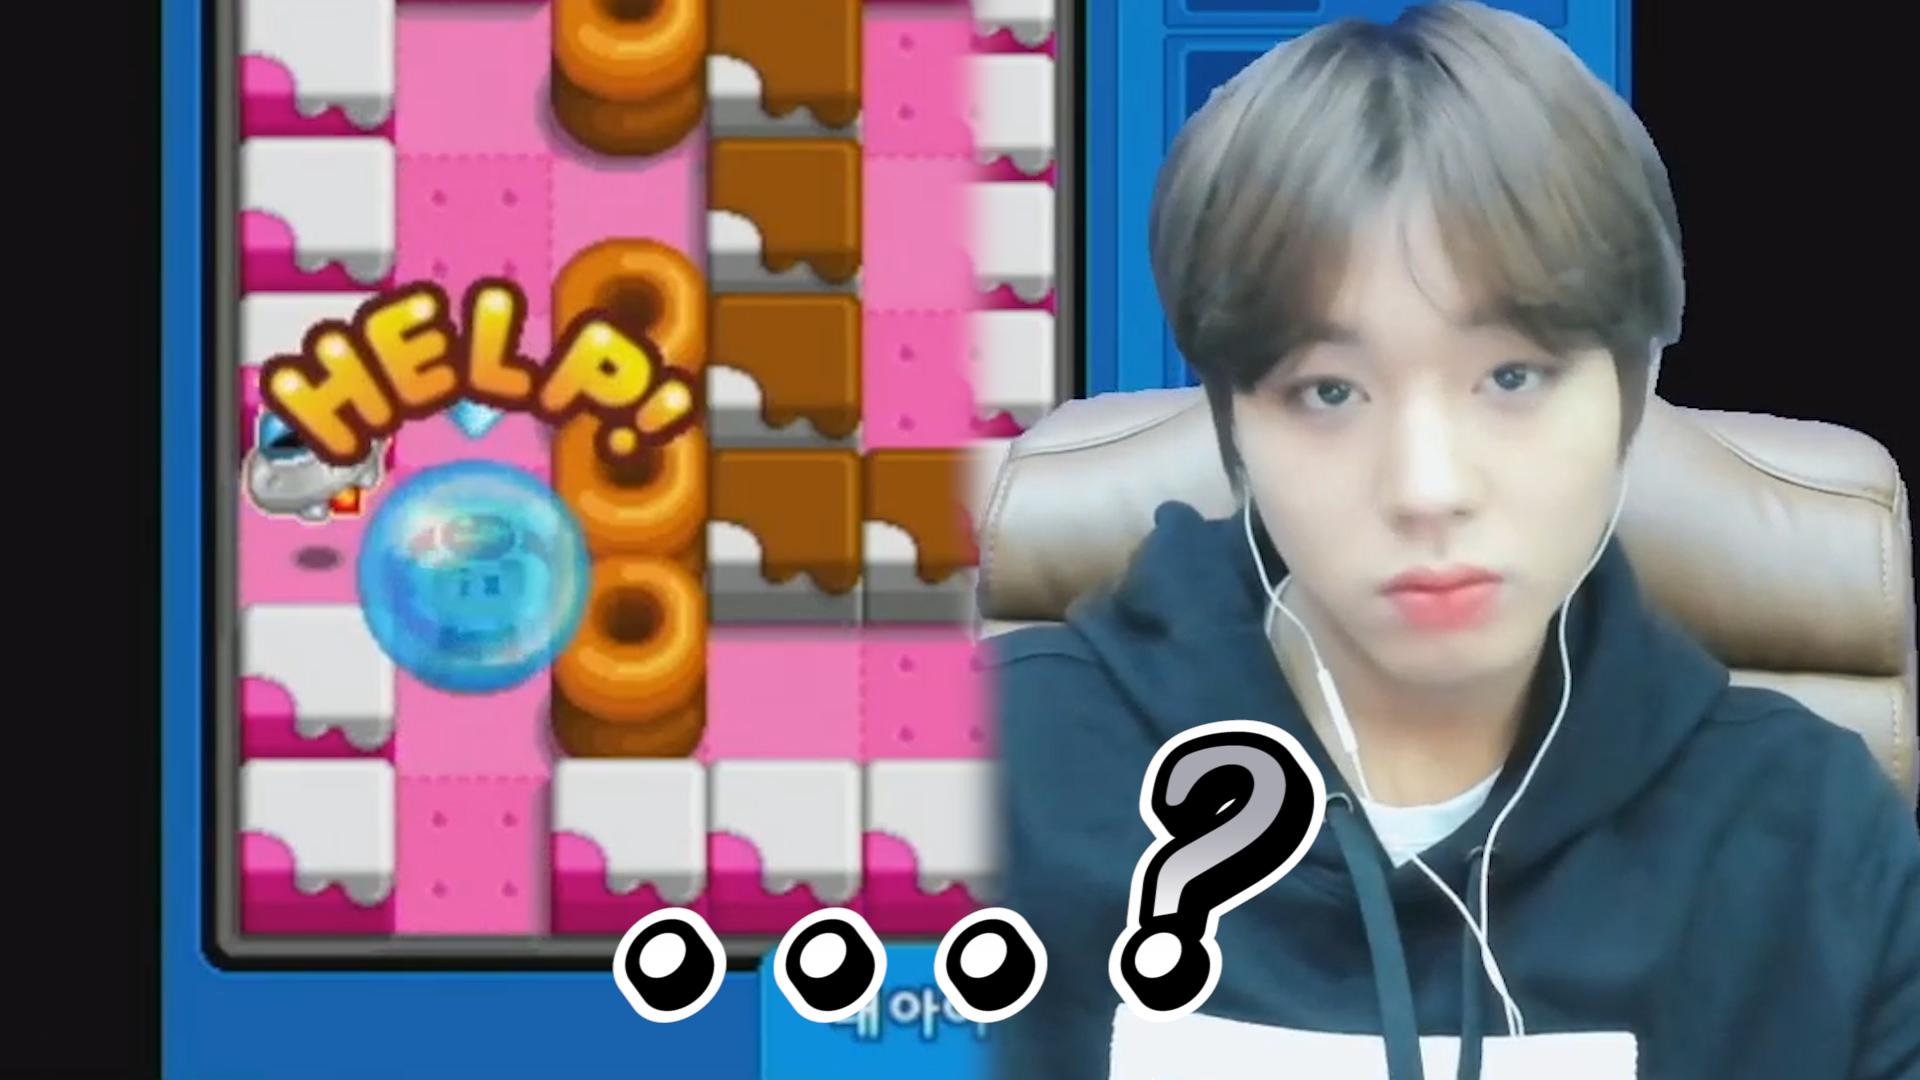 [PARK JI HOON] 크레이지 방귀케이드 왕초보뉴비먕먕,, 내 물풍선에 저장😉💦 (JI HOON playing the game with MAY)